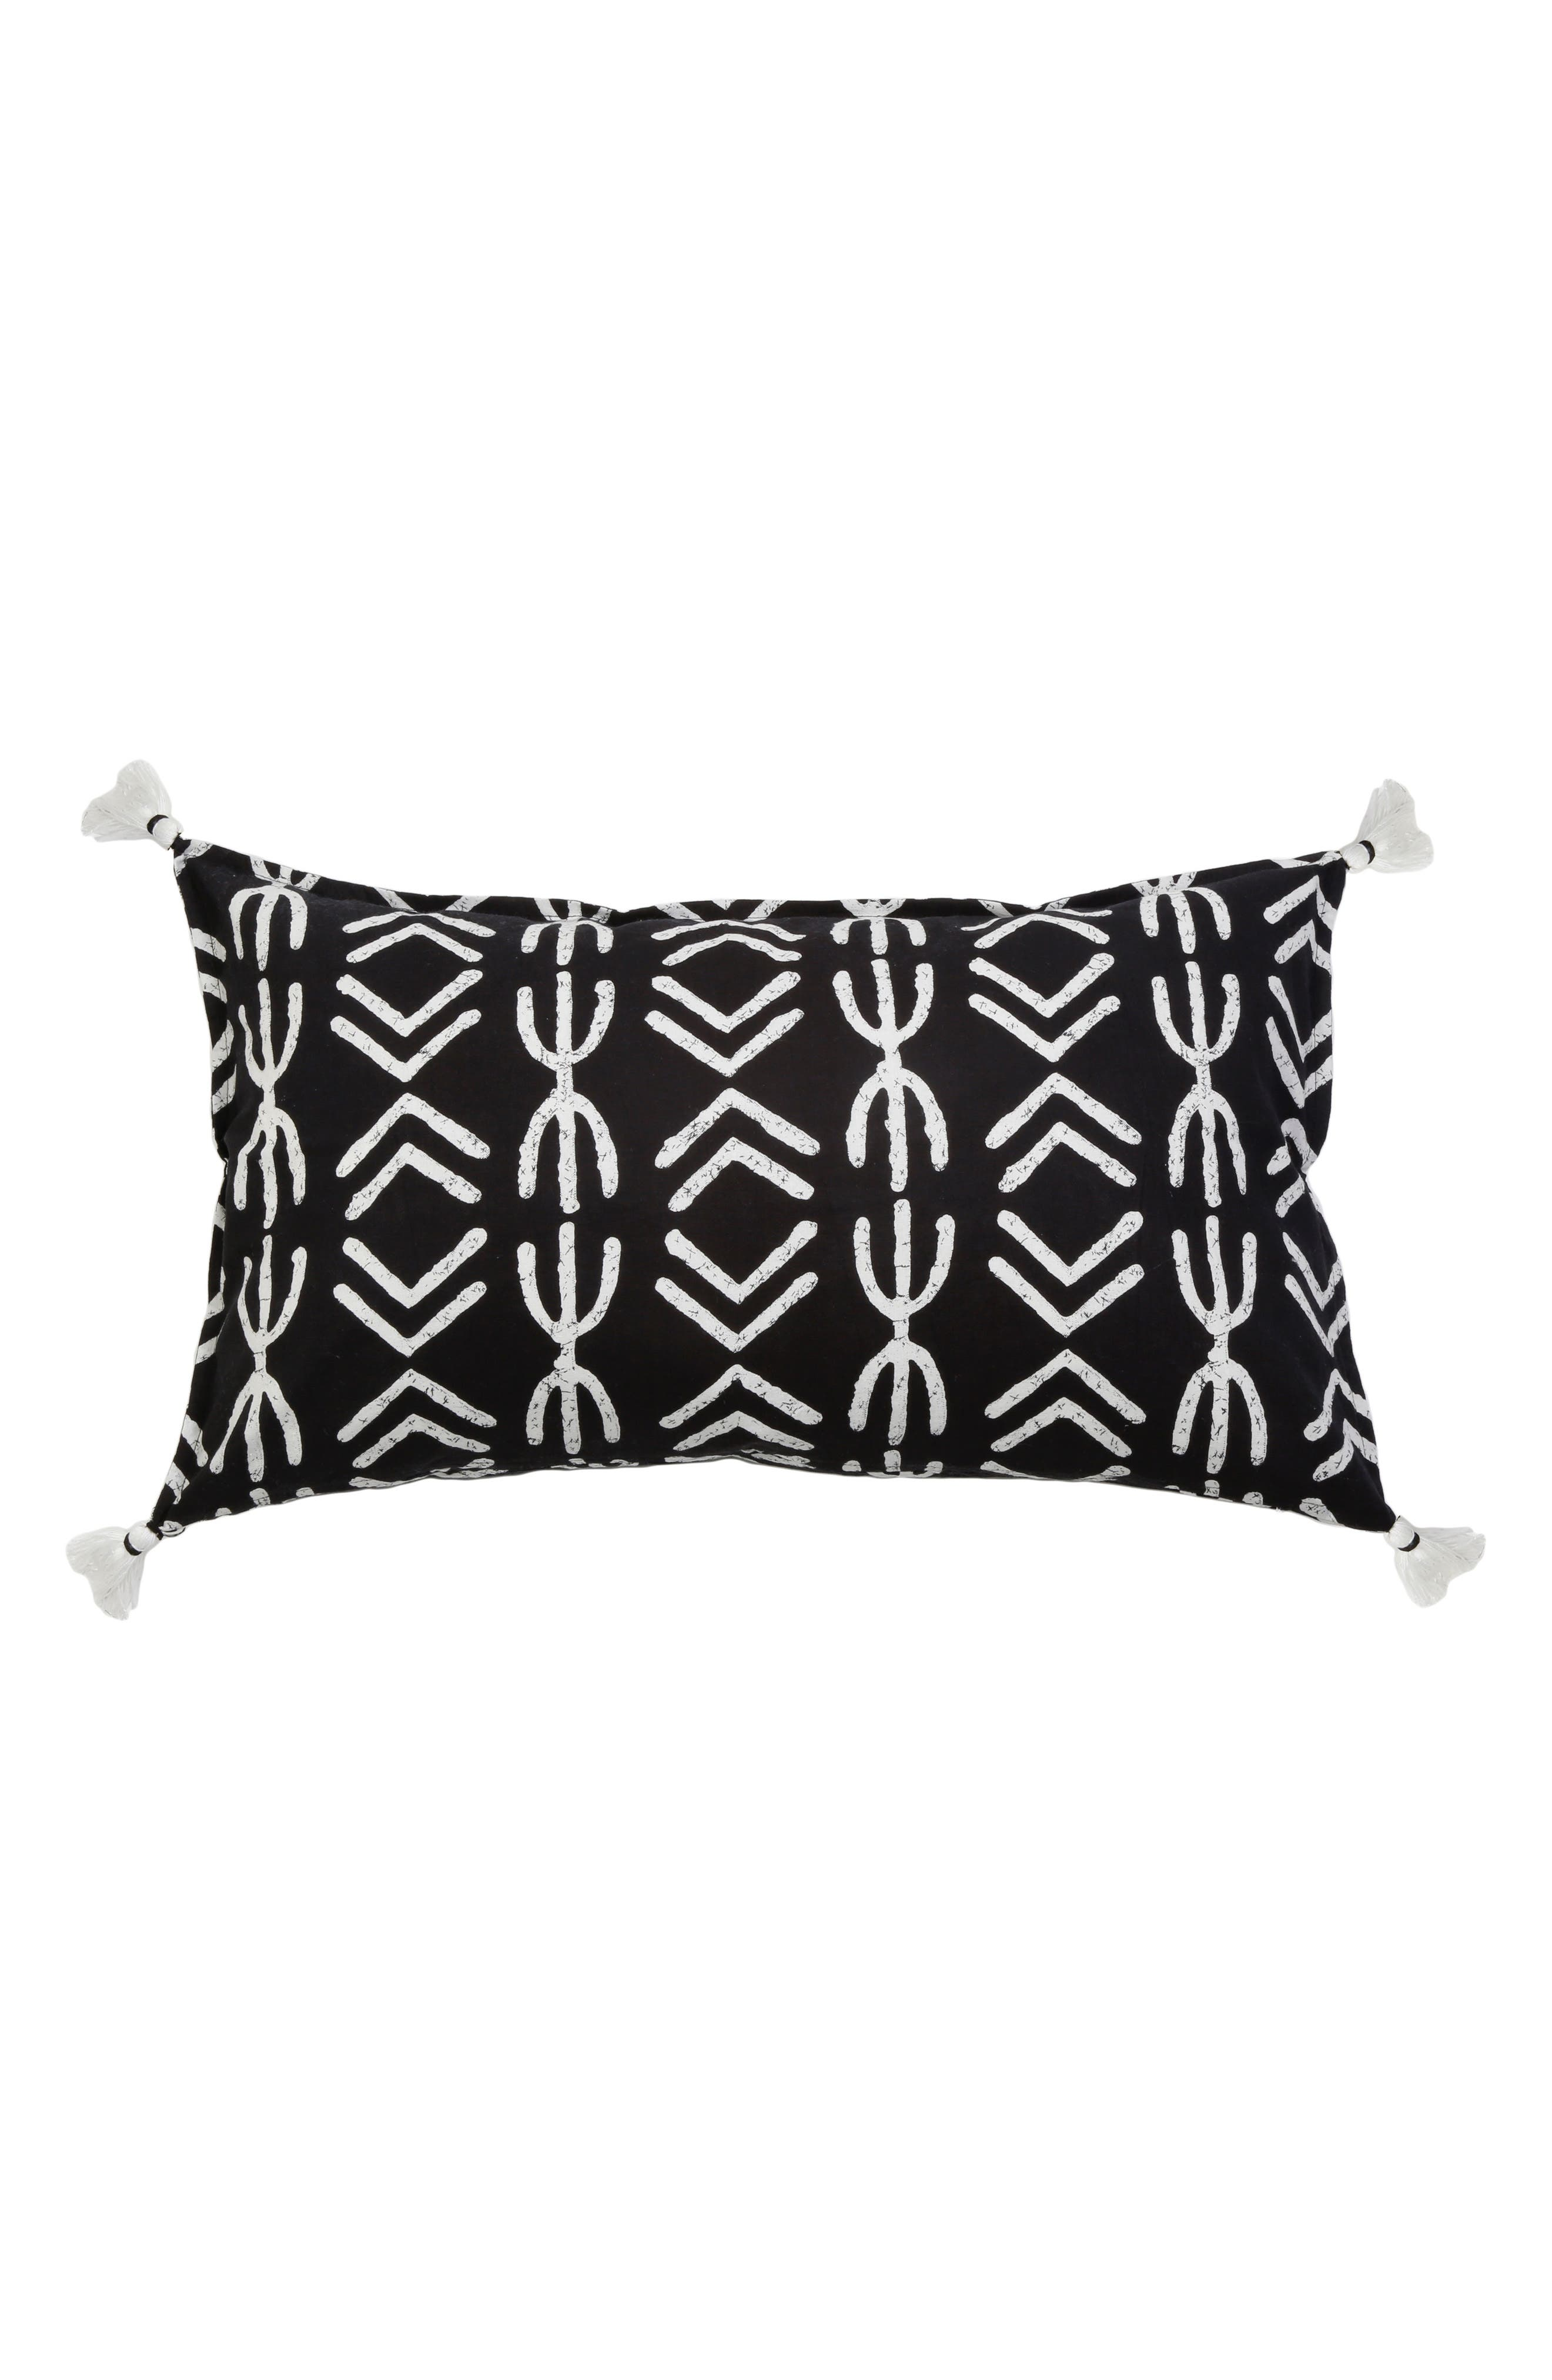 Spear Accent Pillow,                             Main thumbnail 1, color,                             001